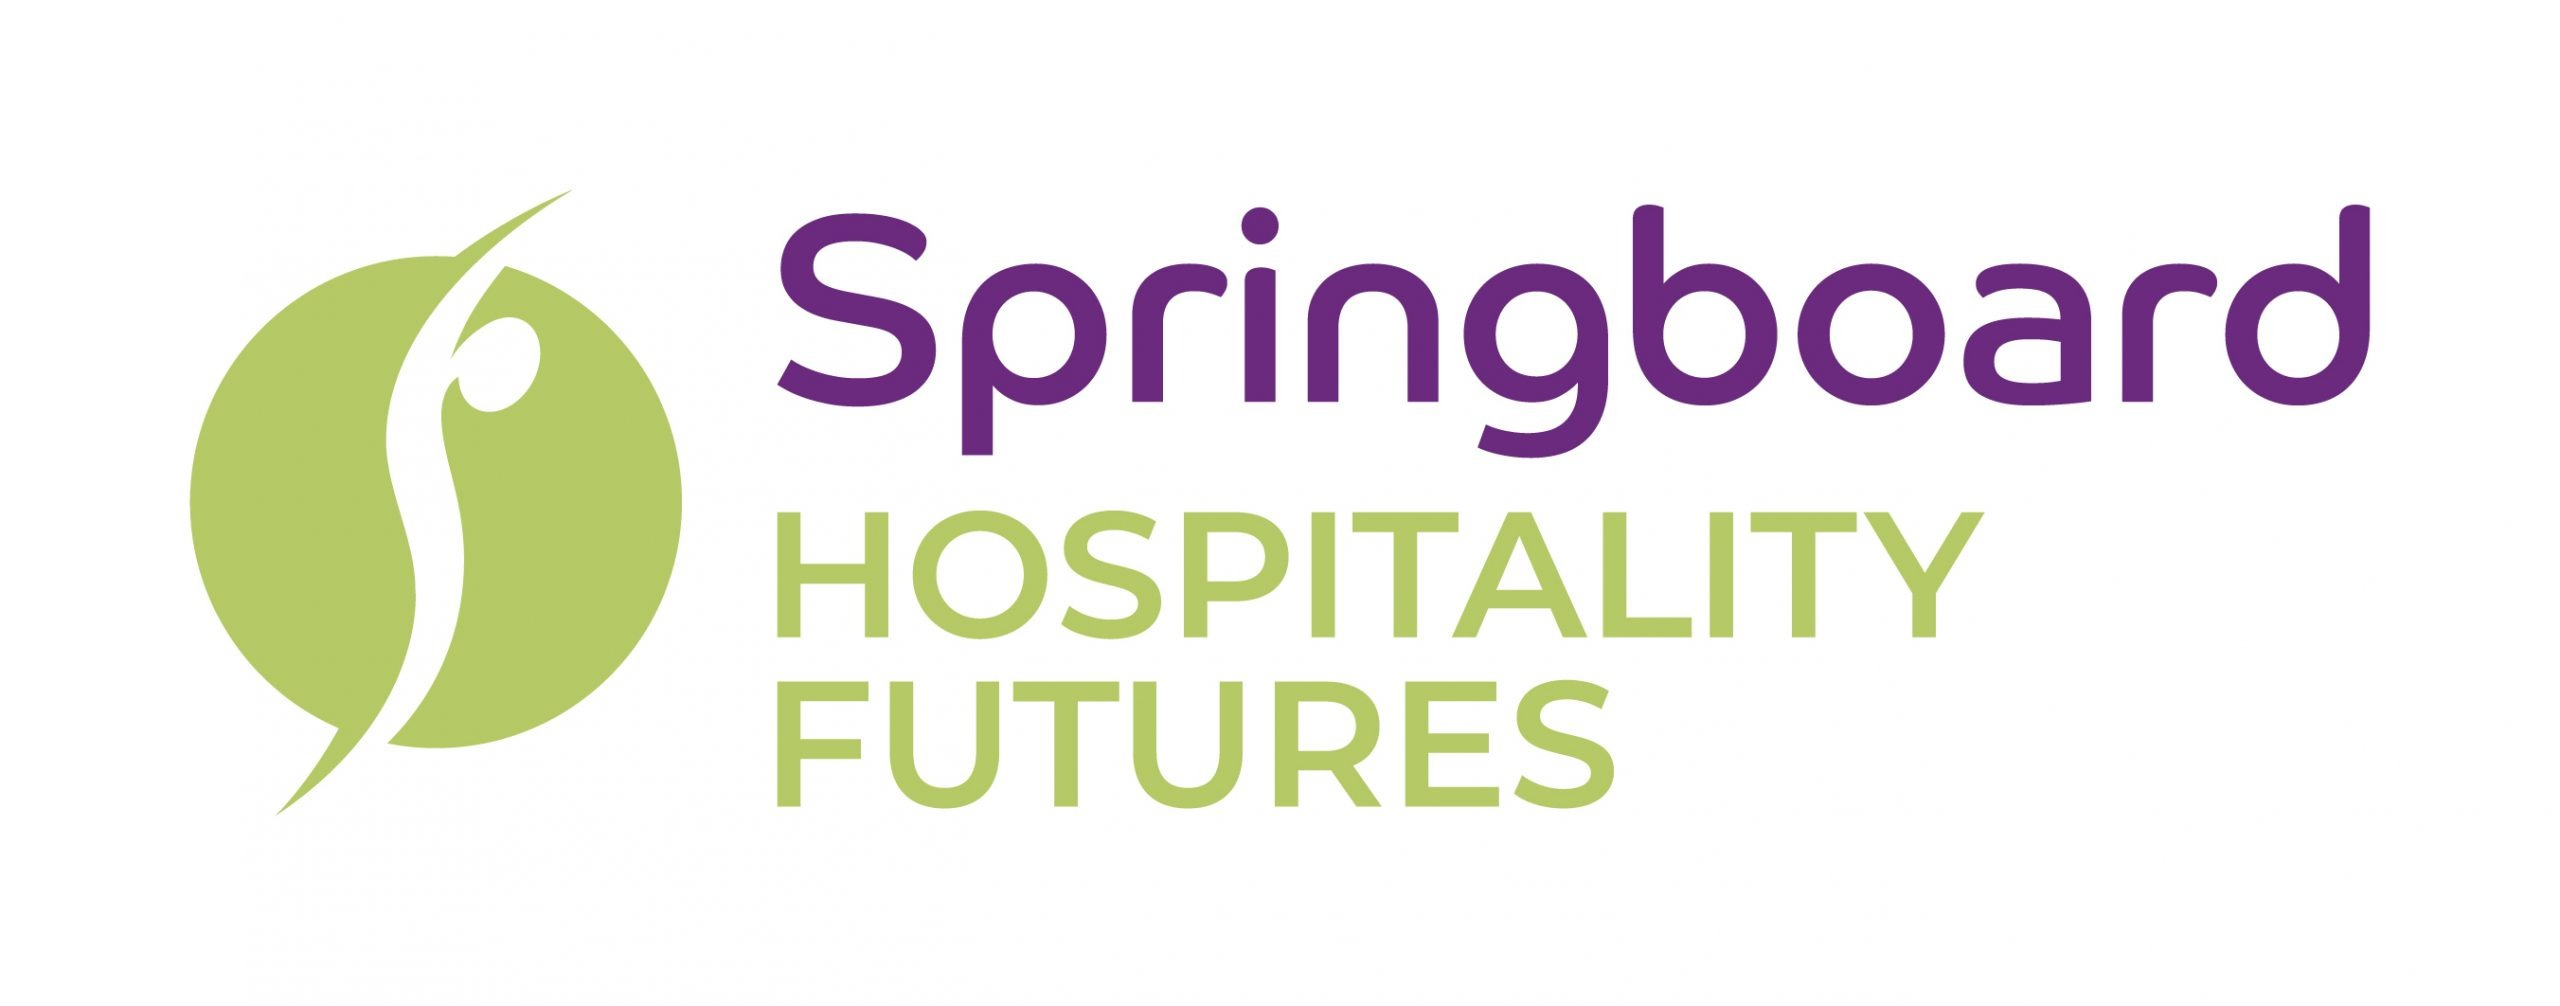 Springboard Hospitality Futures Logo